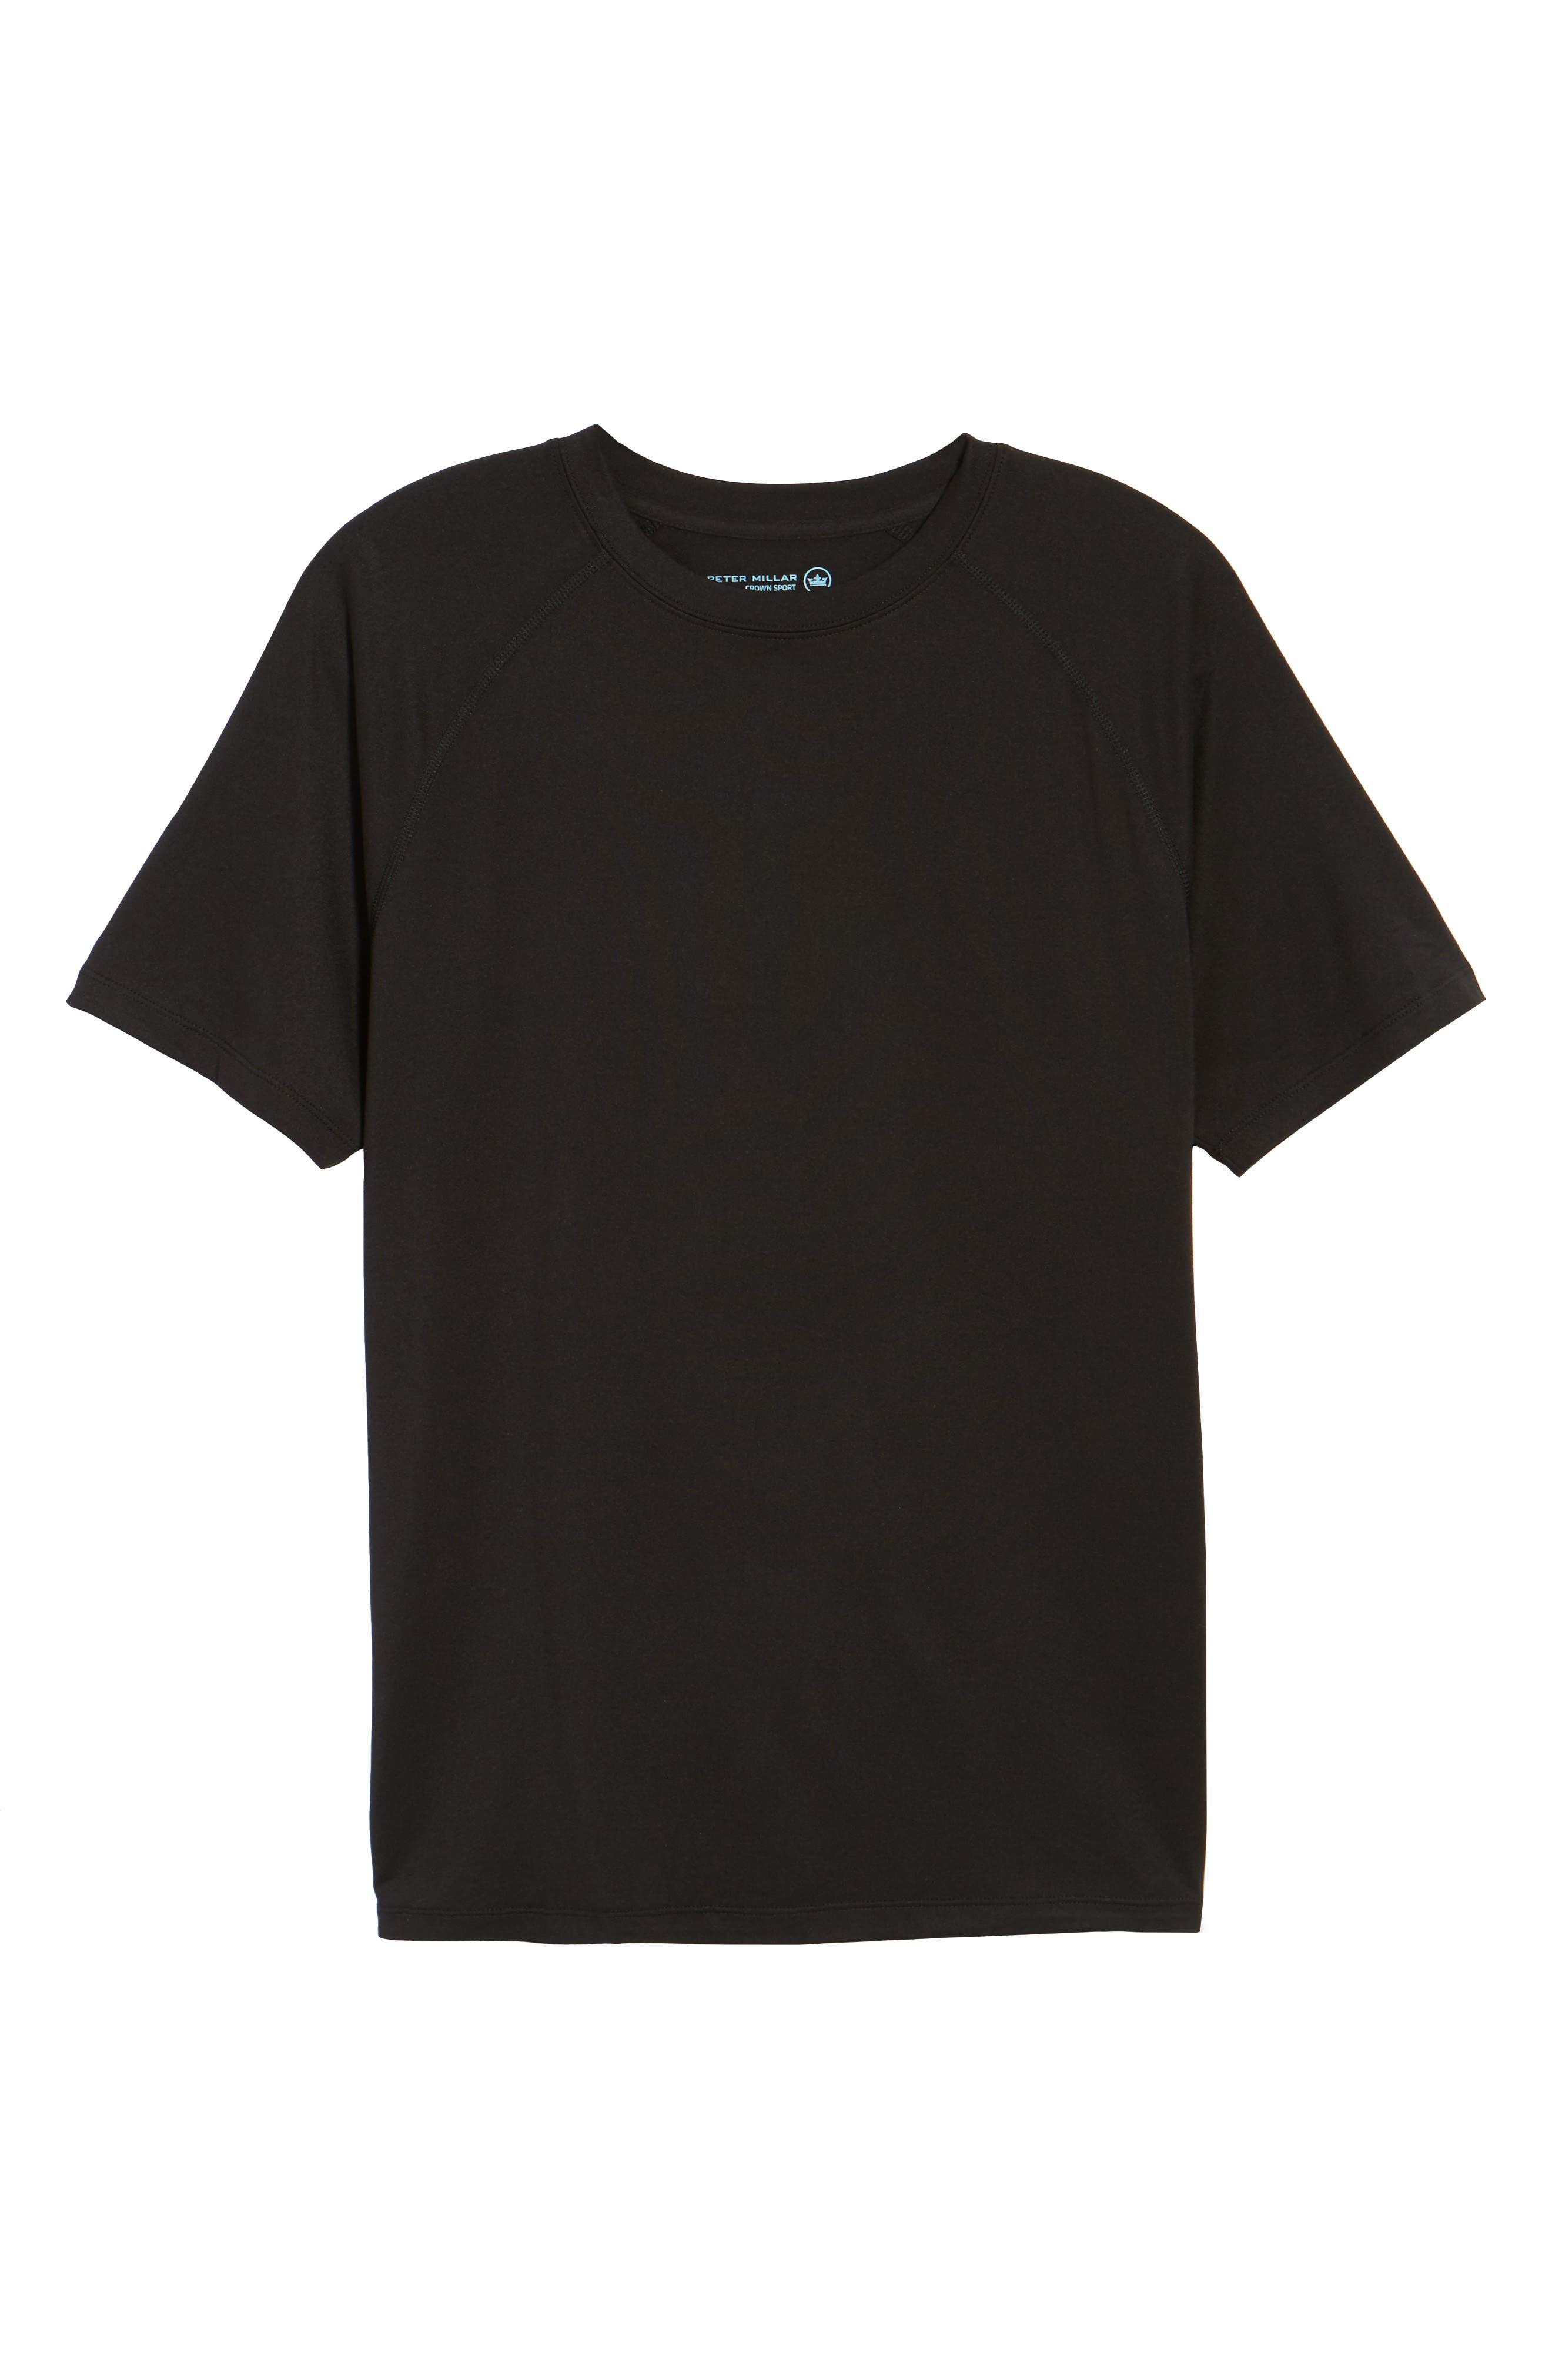 Rio Technical T-Shirt,                             Alternate thumbnail 6, color,                             001